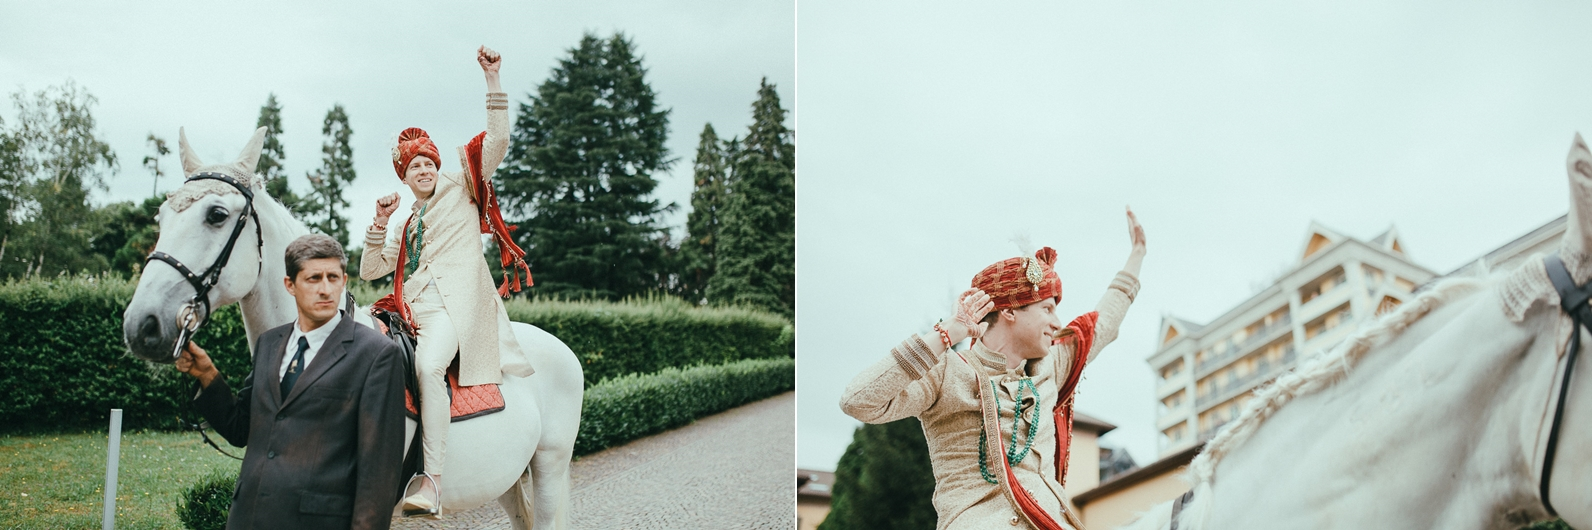 indian-wedding-photographer-italy (12).jpg